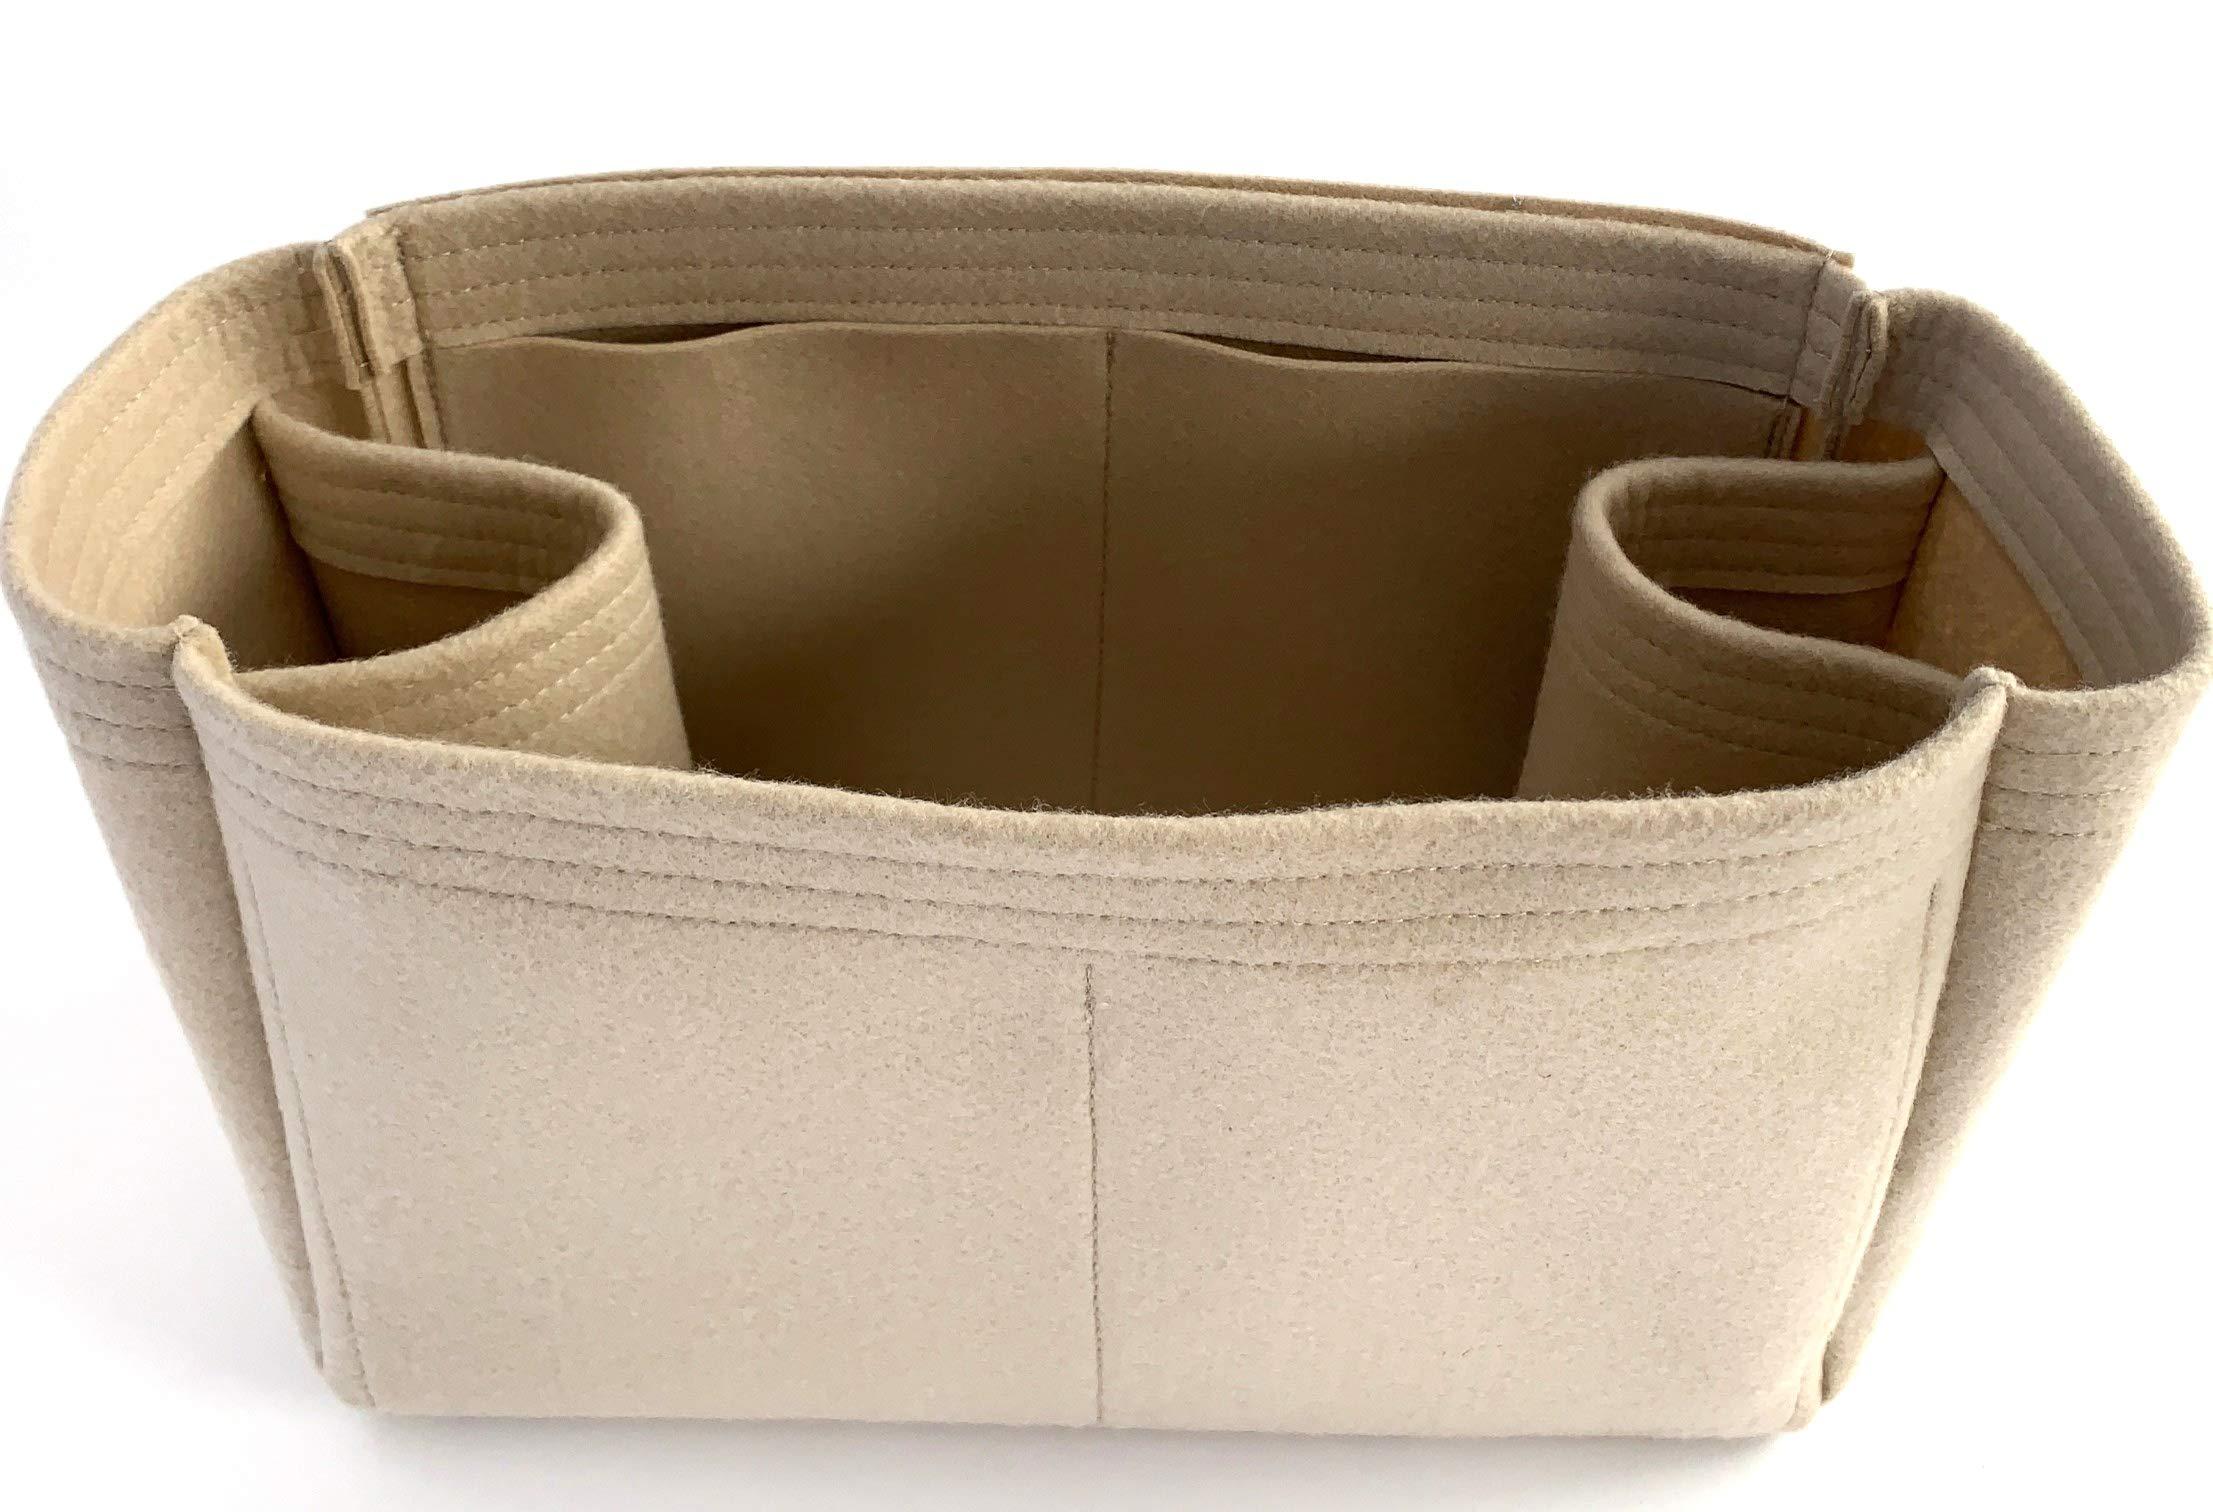 Purse Organizer Insert for LV Totally Handbag - Fits inside Louis Vuitton Totally bag - Thick Wool Blend Felt (MM, Beige)